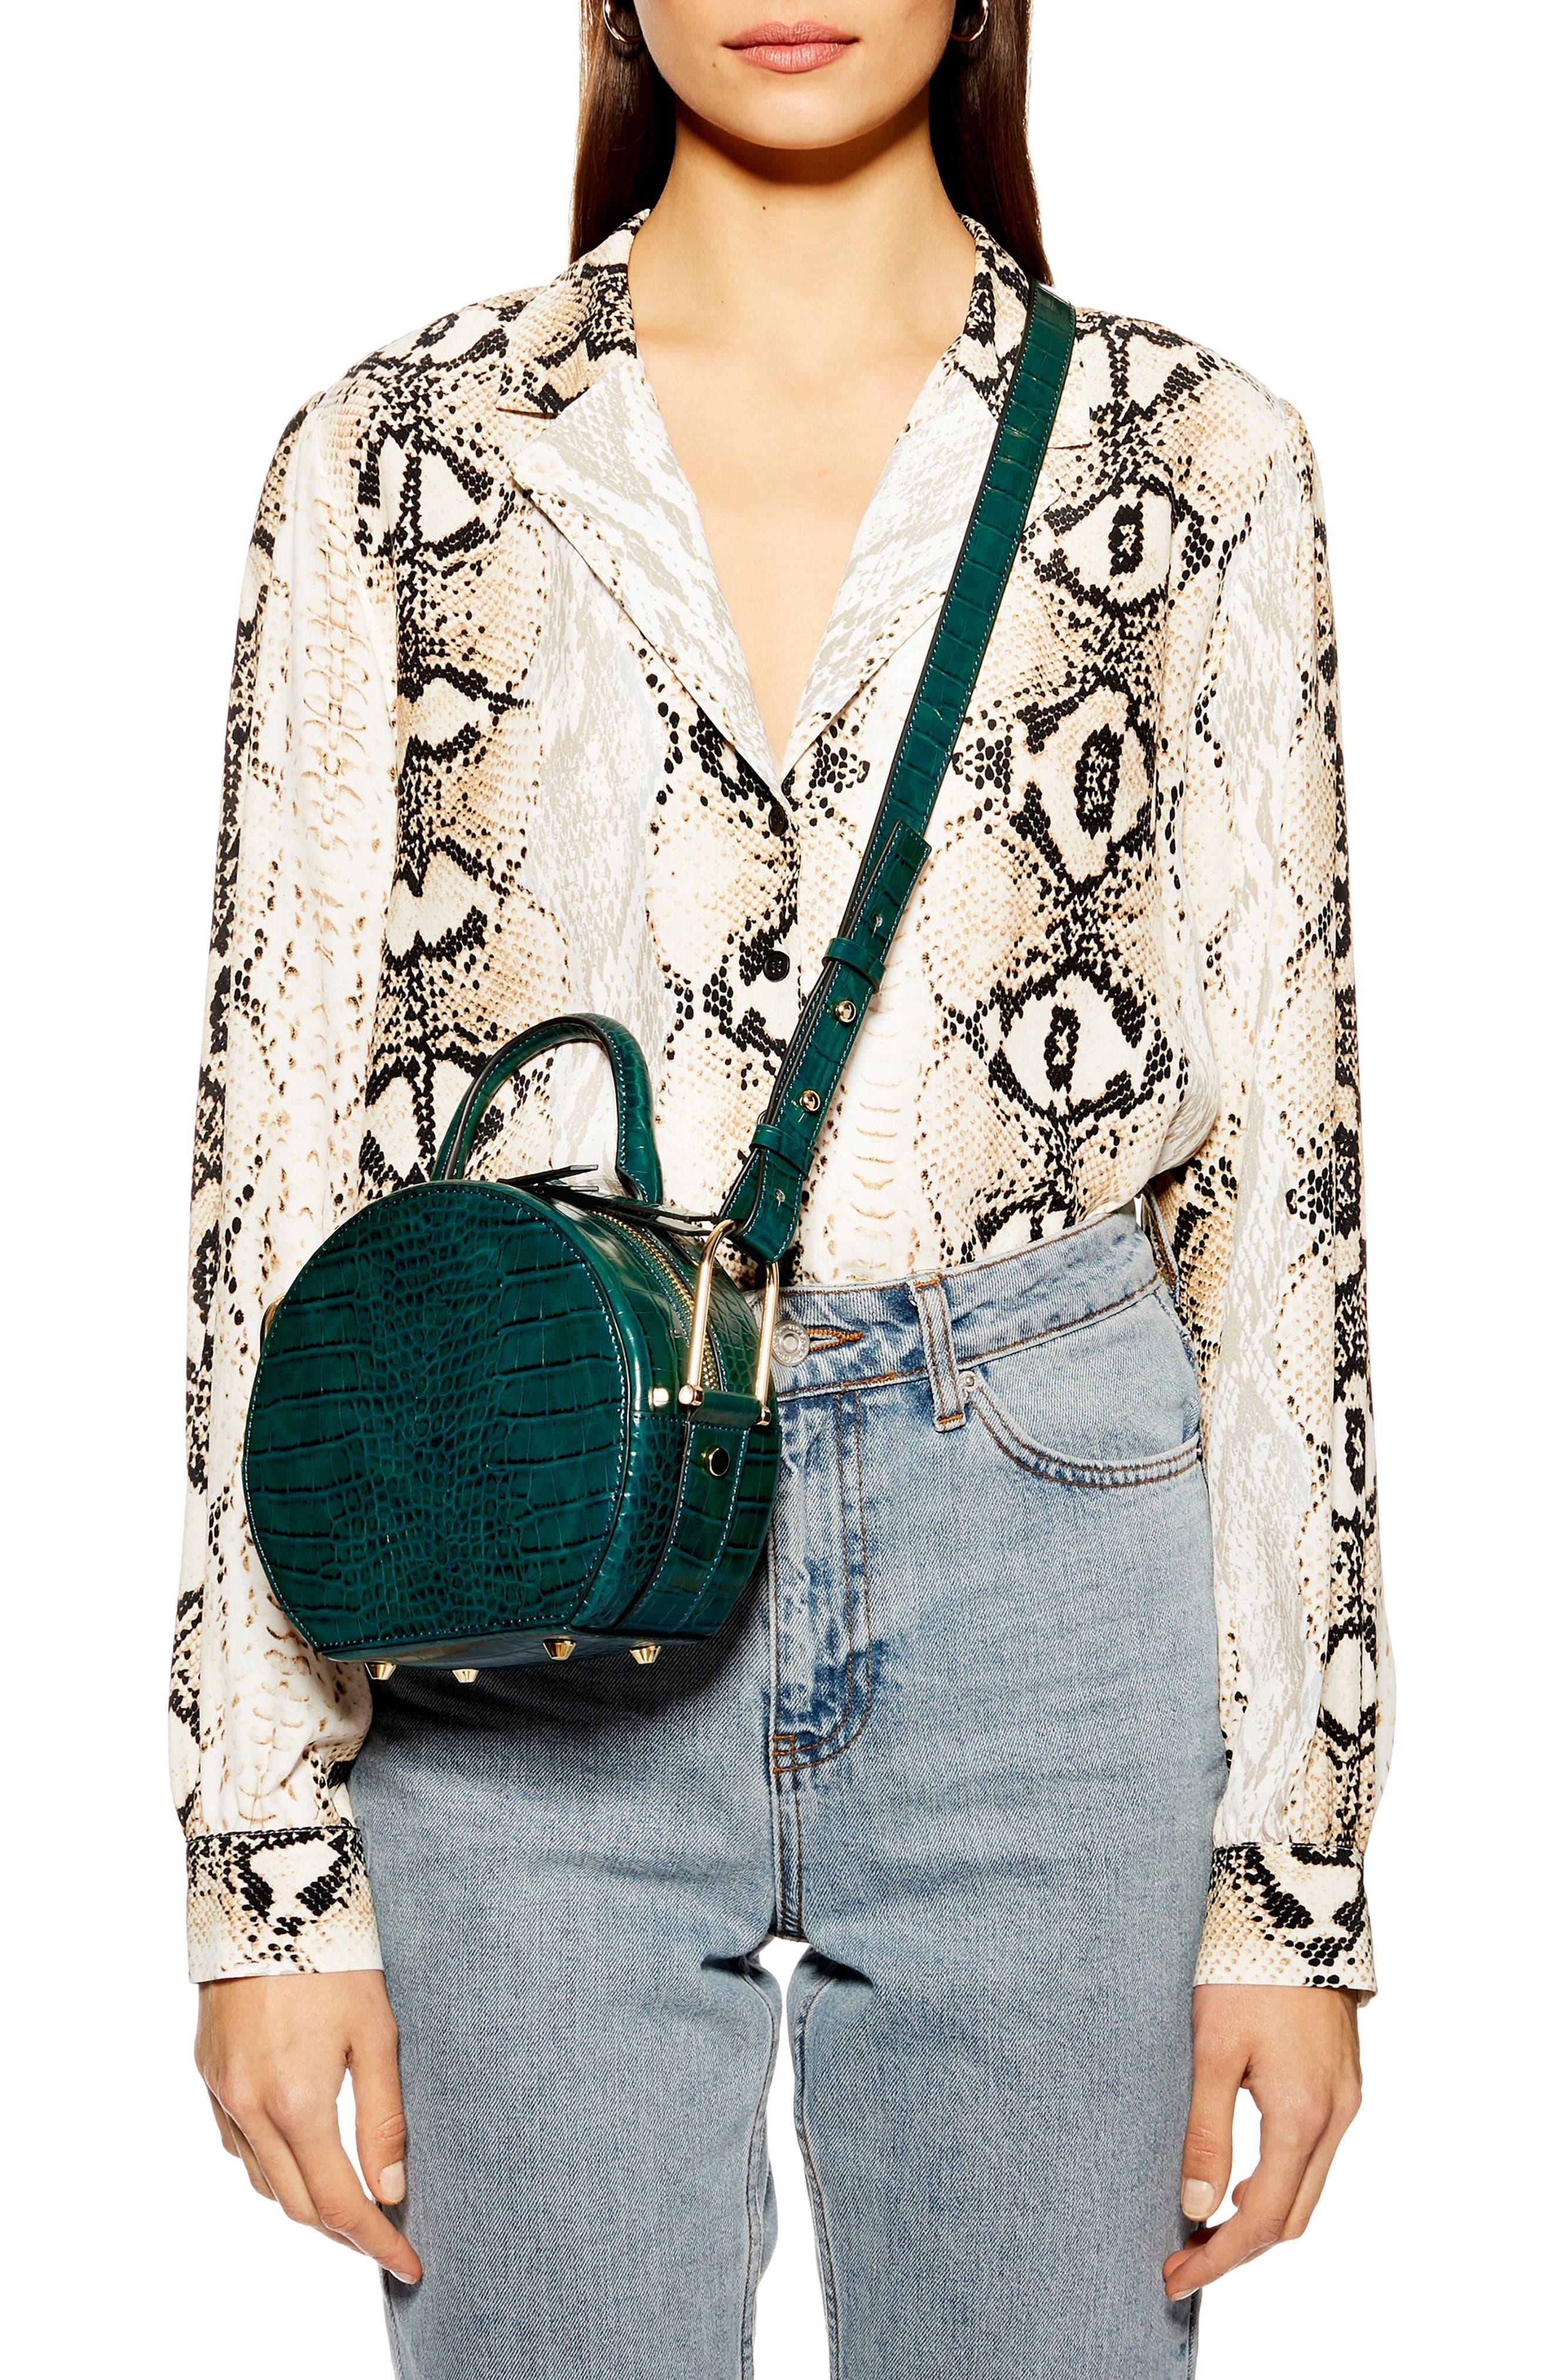 Blair Circle Bag,                             Alternate thumbnail 2, color,                             GREEN